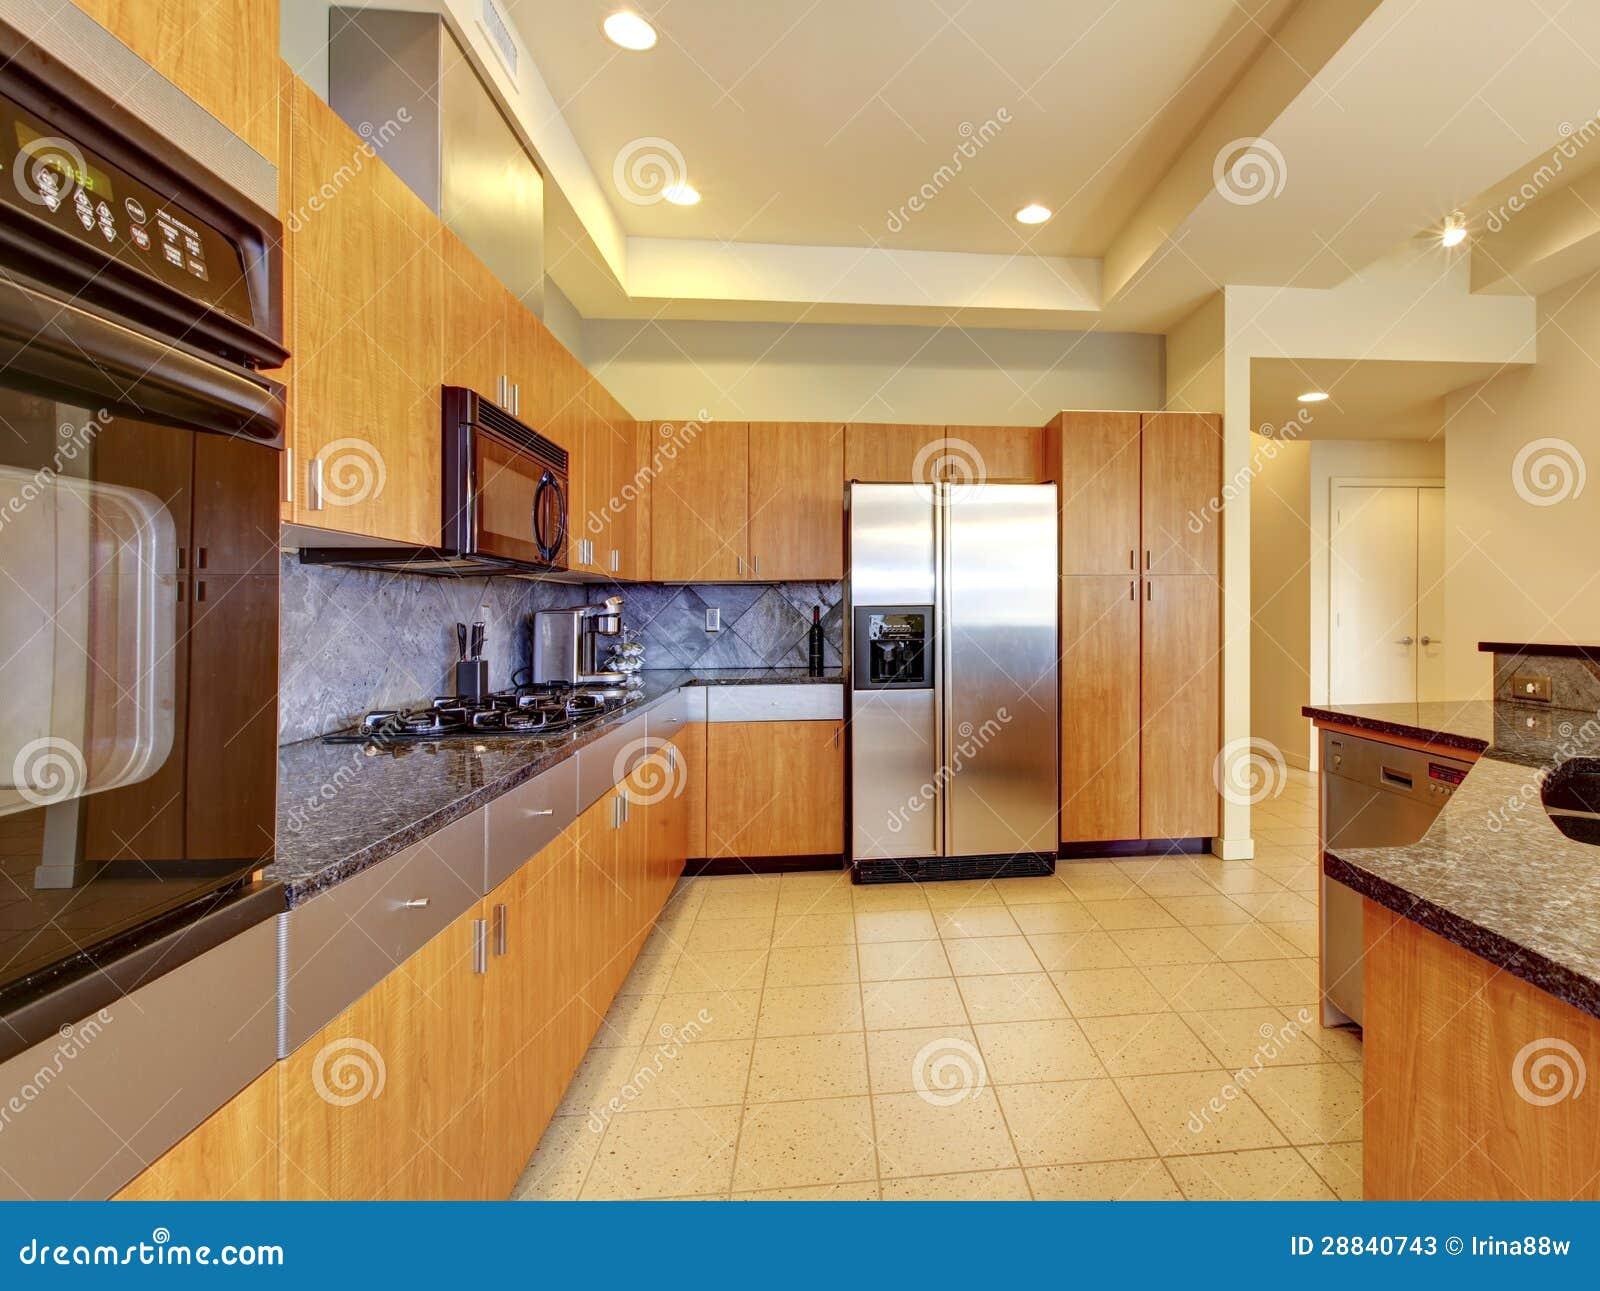 Grote Moderne Houten Keuken Met Woonkamer En Hoog Plafond. Stock ...